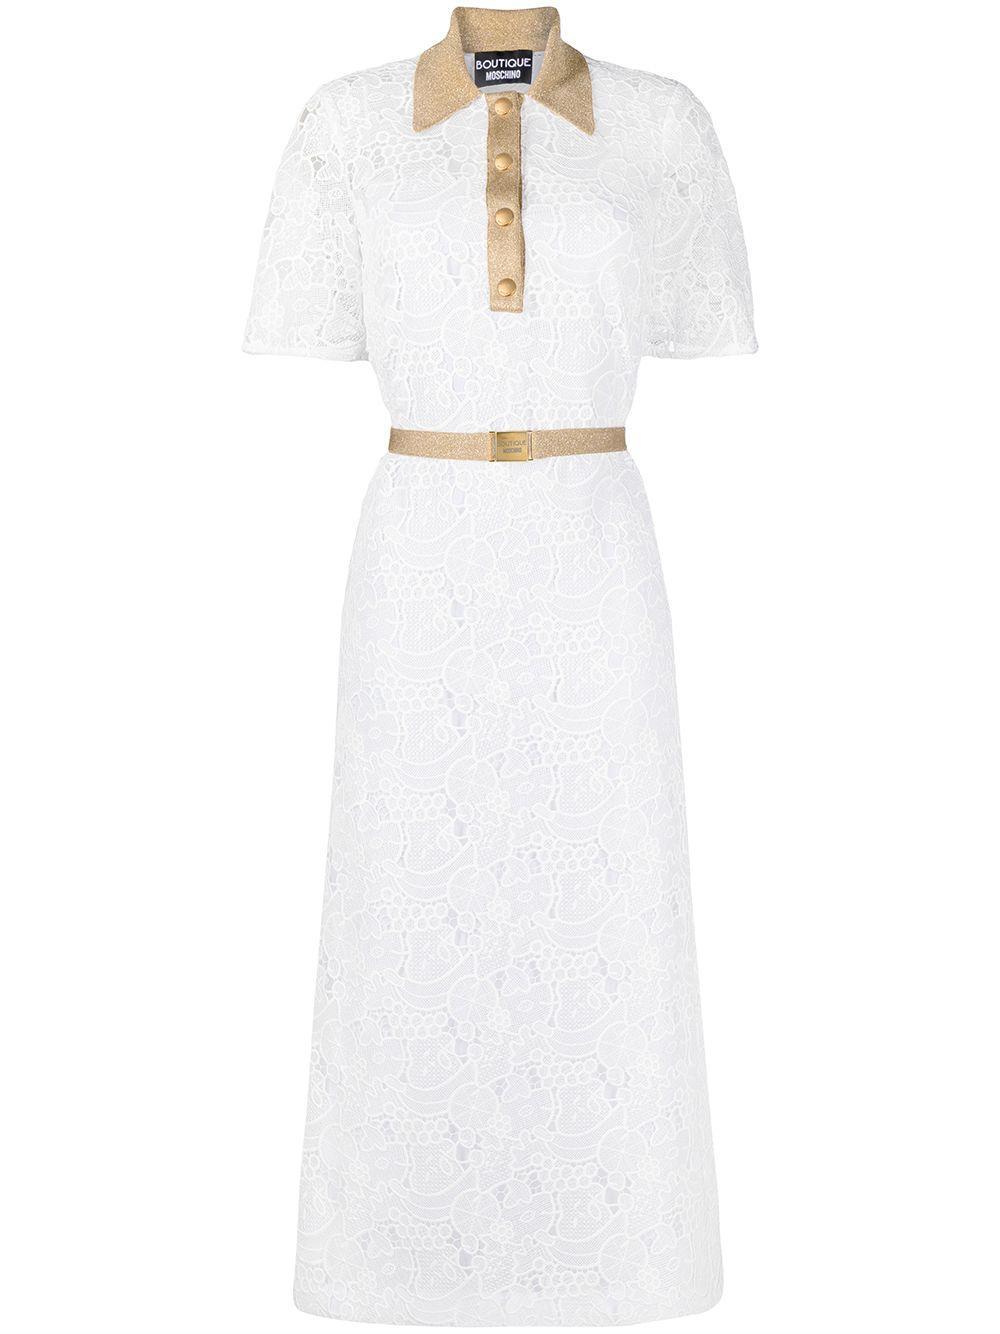 Lace Midi Dress With Contrast Trim Item # 4140833